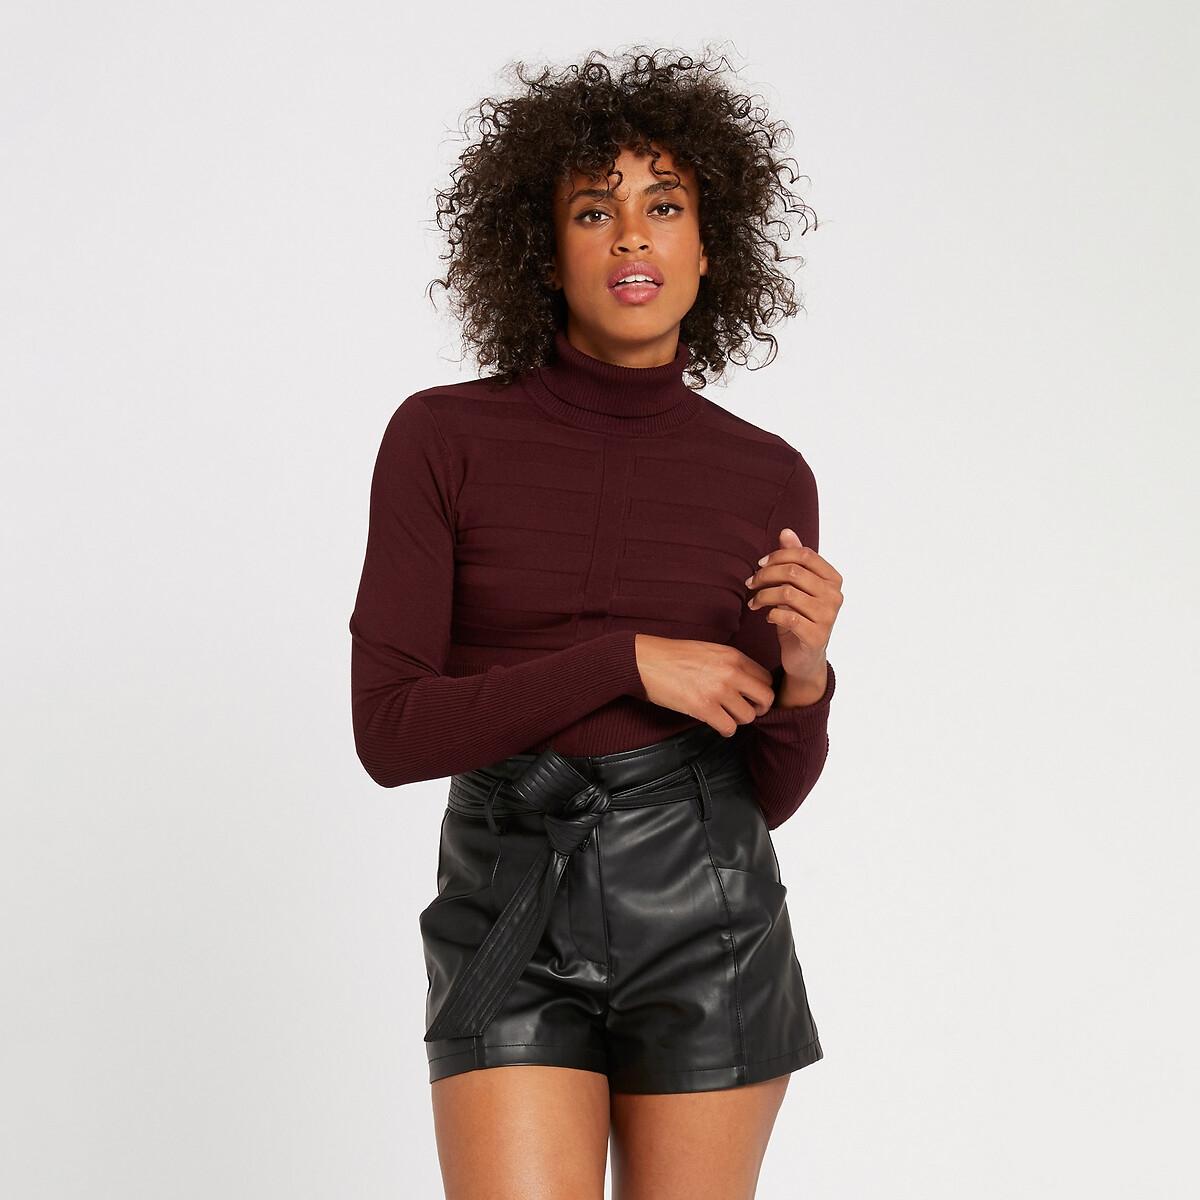 Пуловер La Redoute Из тонкого трикотажа L красный пуловер la redoute из тонкого трикотажа со шнуровкой l бежевый